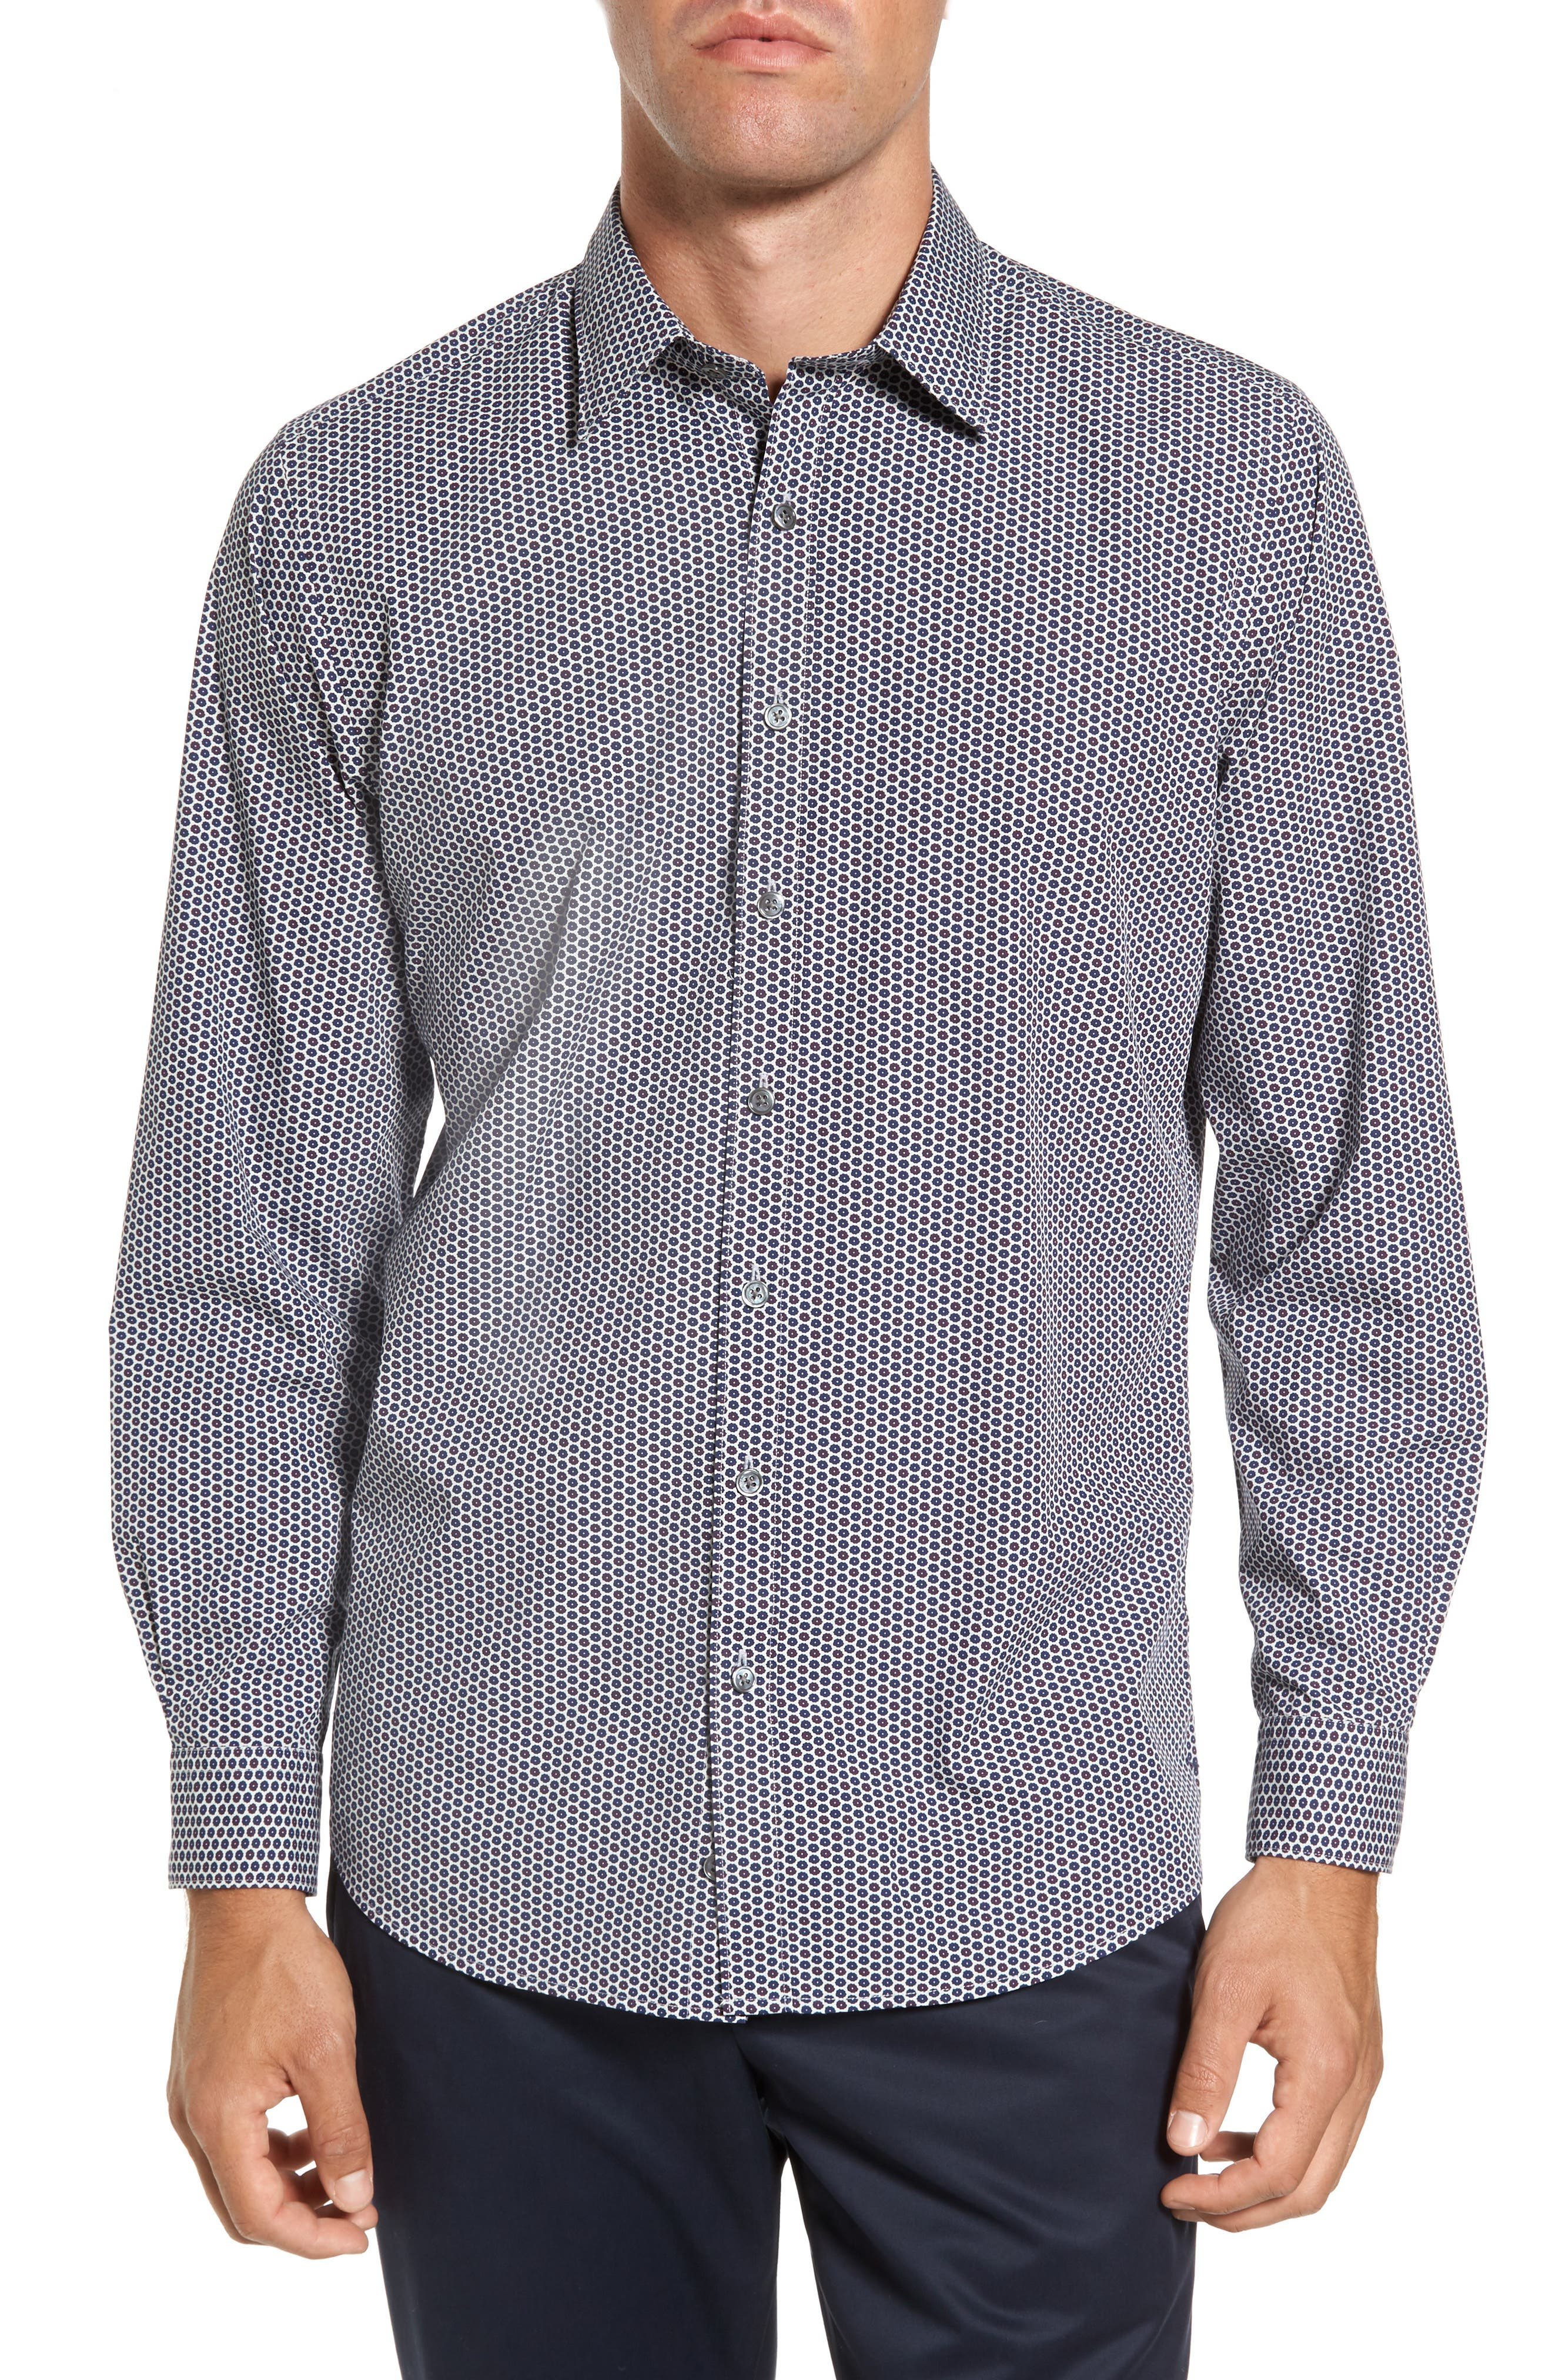 Main Image - Rodd & Gunn Flax Island Regular Fit Floral Sport Shirt